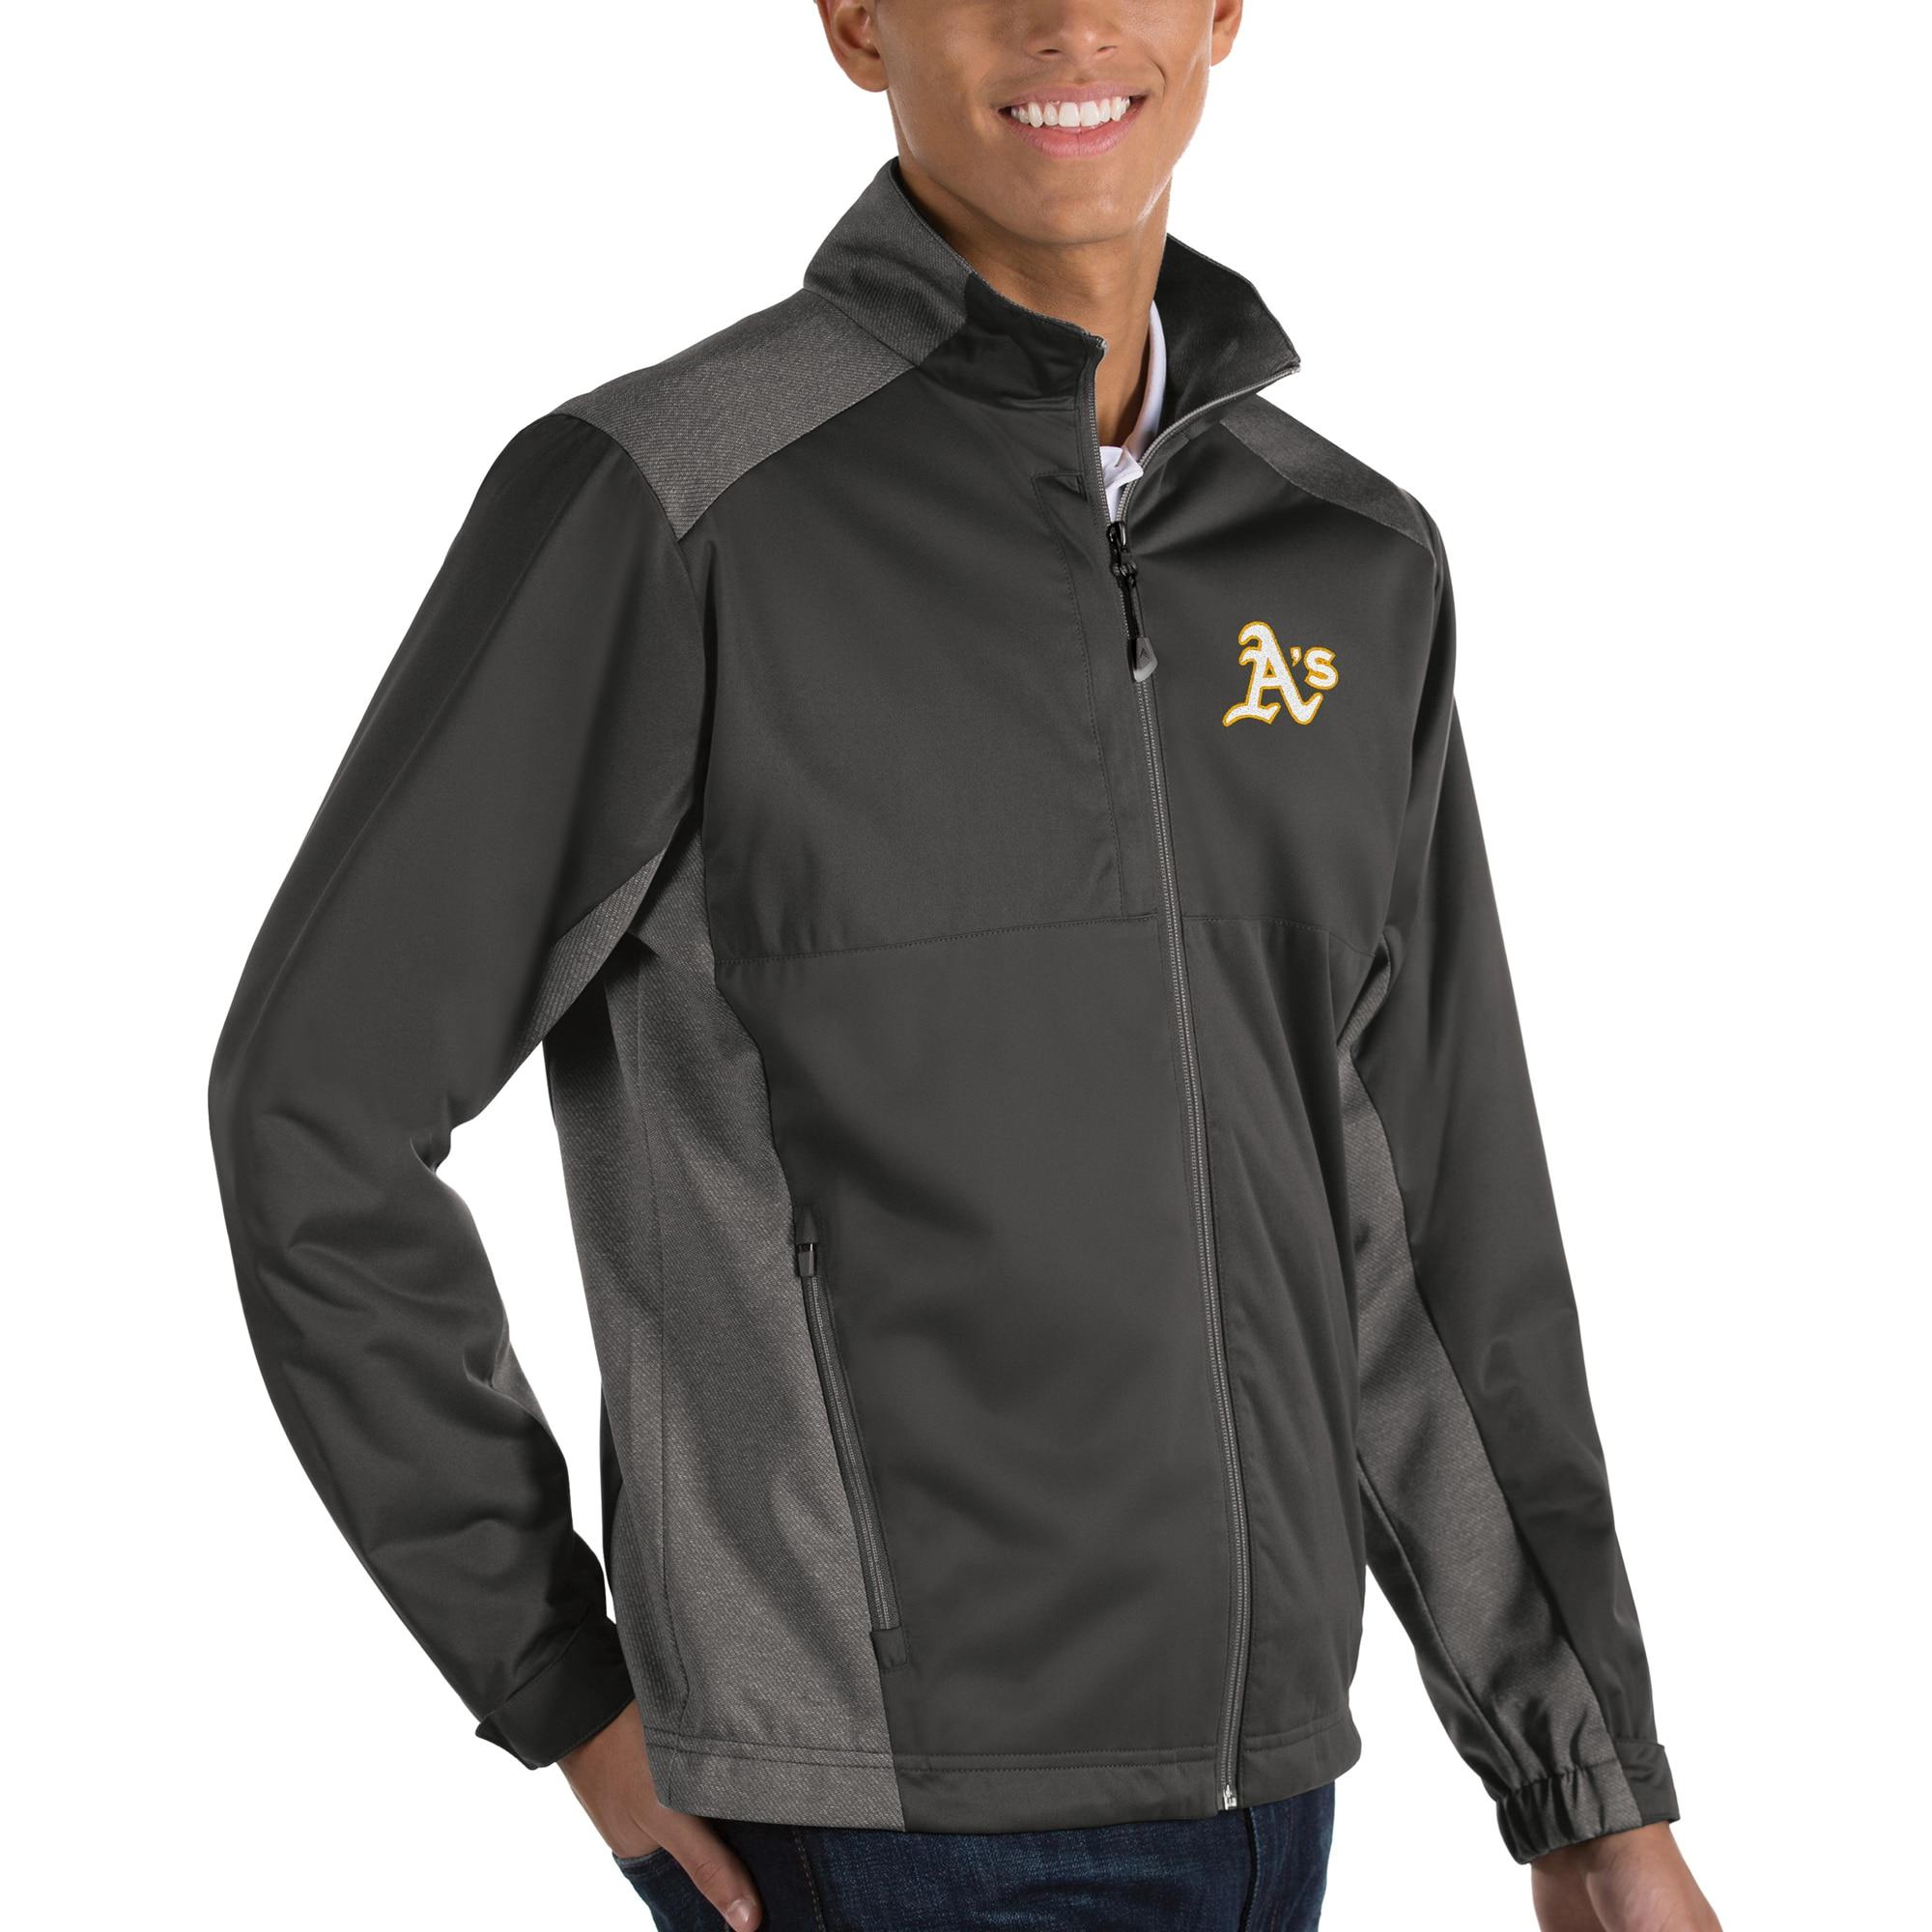 Oakland Athletics Antigua Revolve Full-Zip Jacket - Charcoal